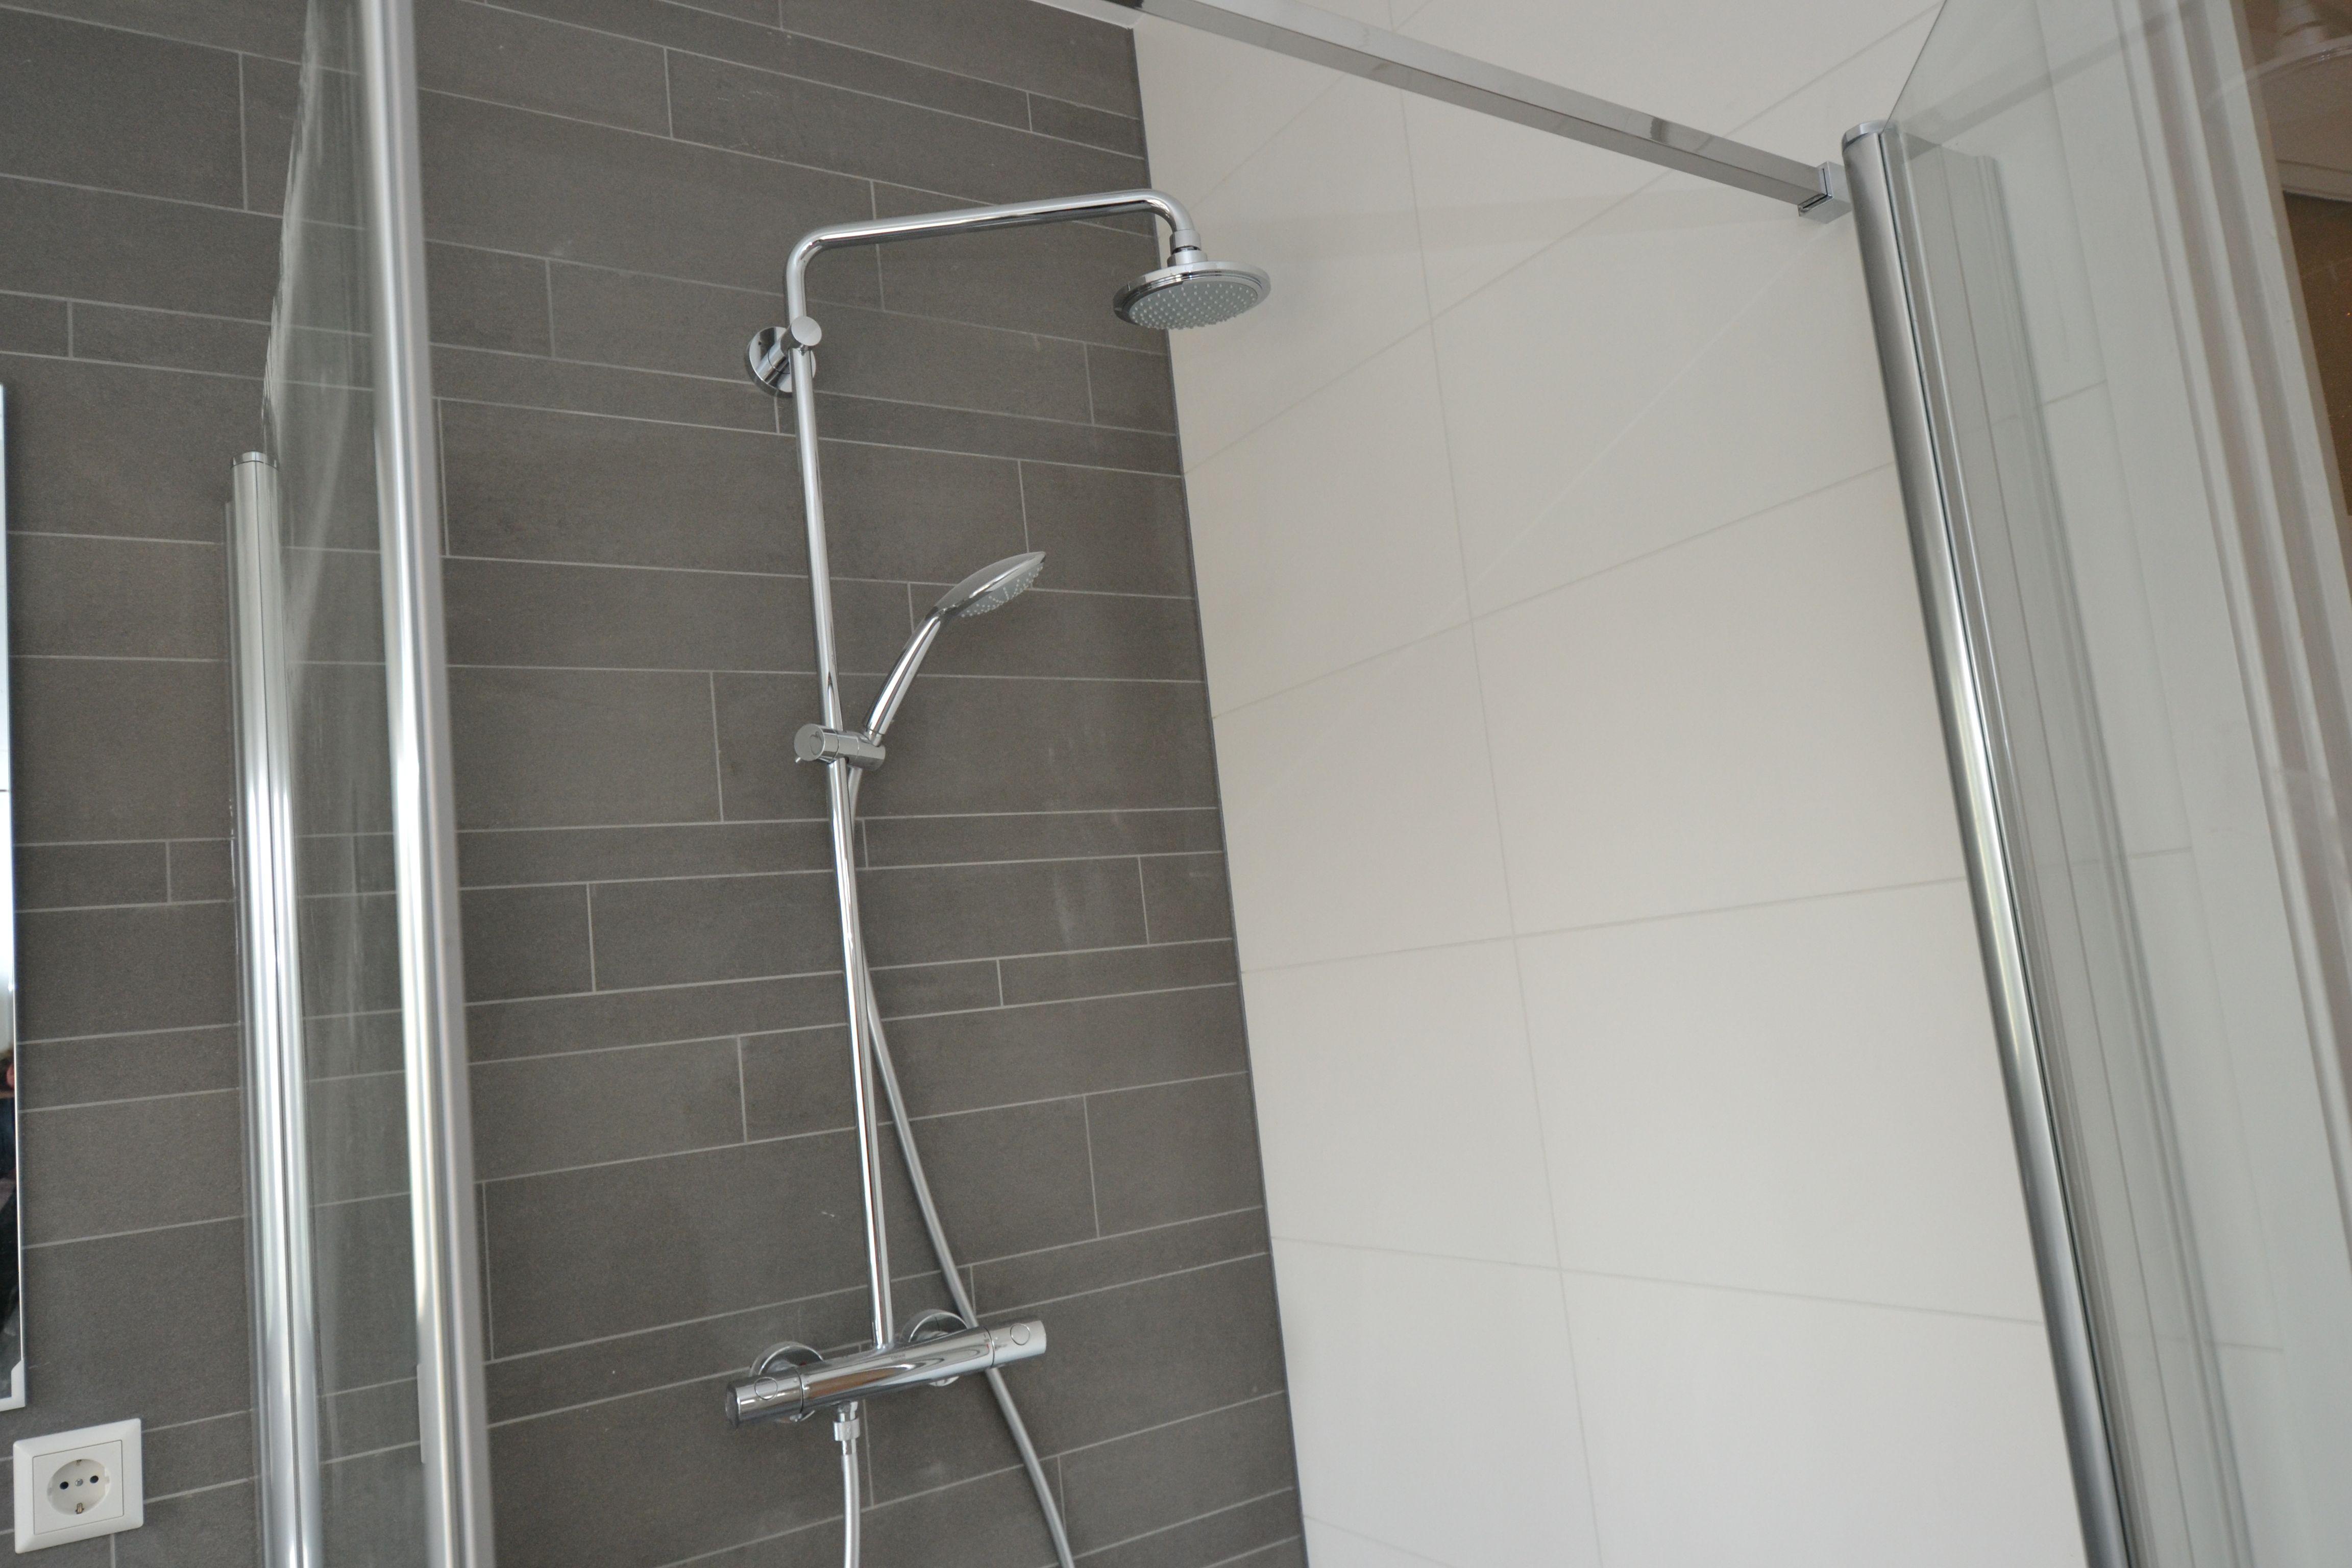 Badkamer Installatie Haarlem : Nieuwe badkamer haarlem omstreken